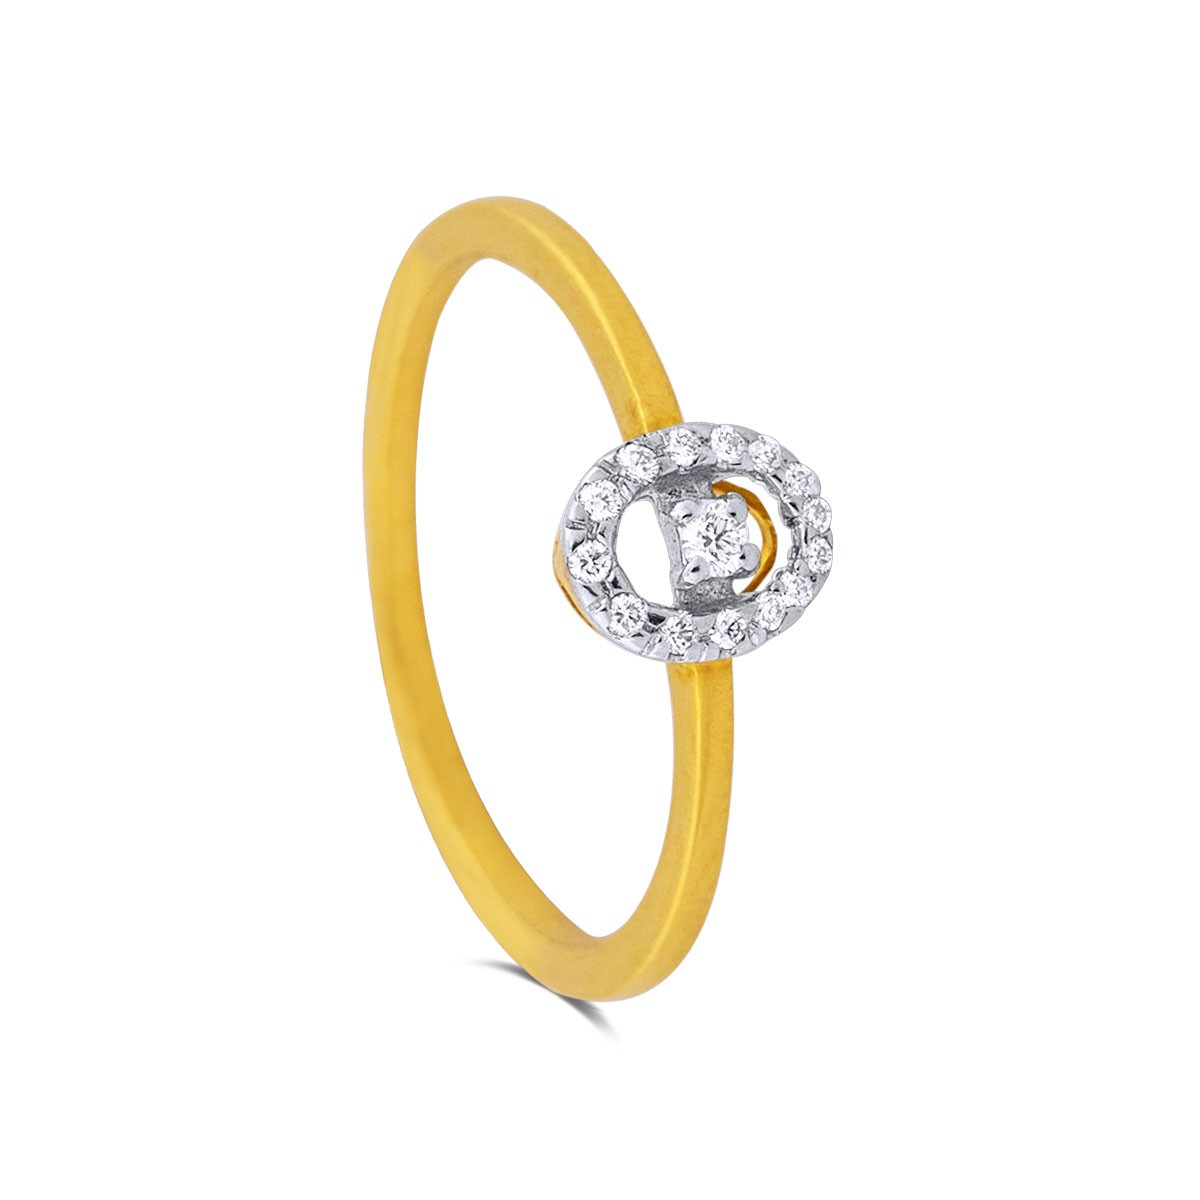 Callen Yellow Gold Diamond Ring